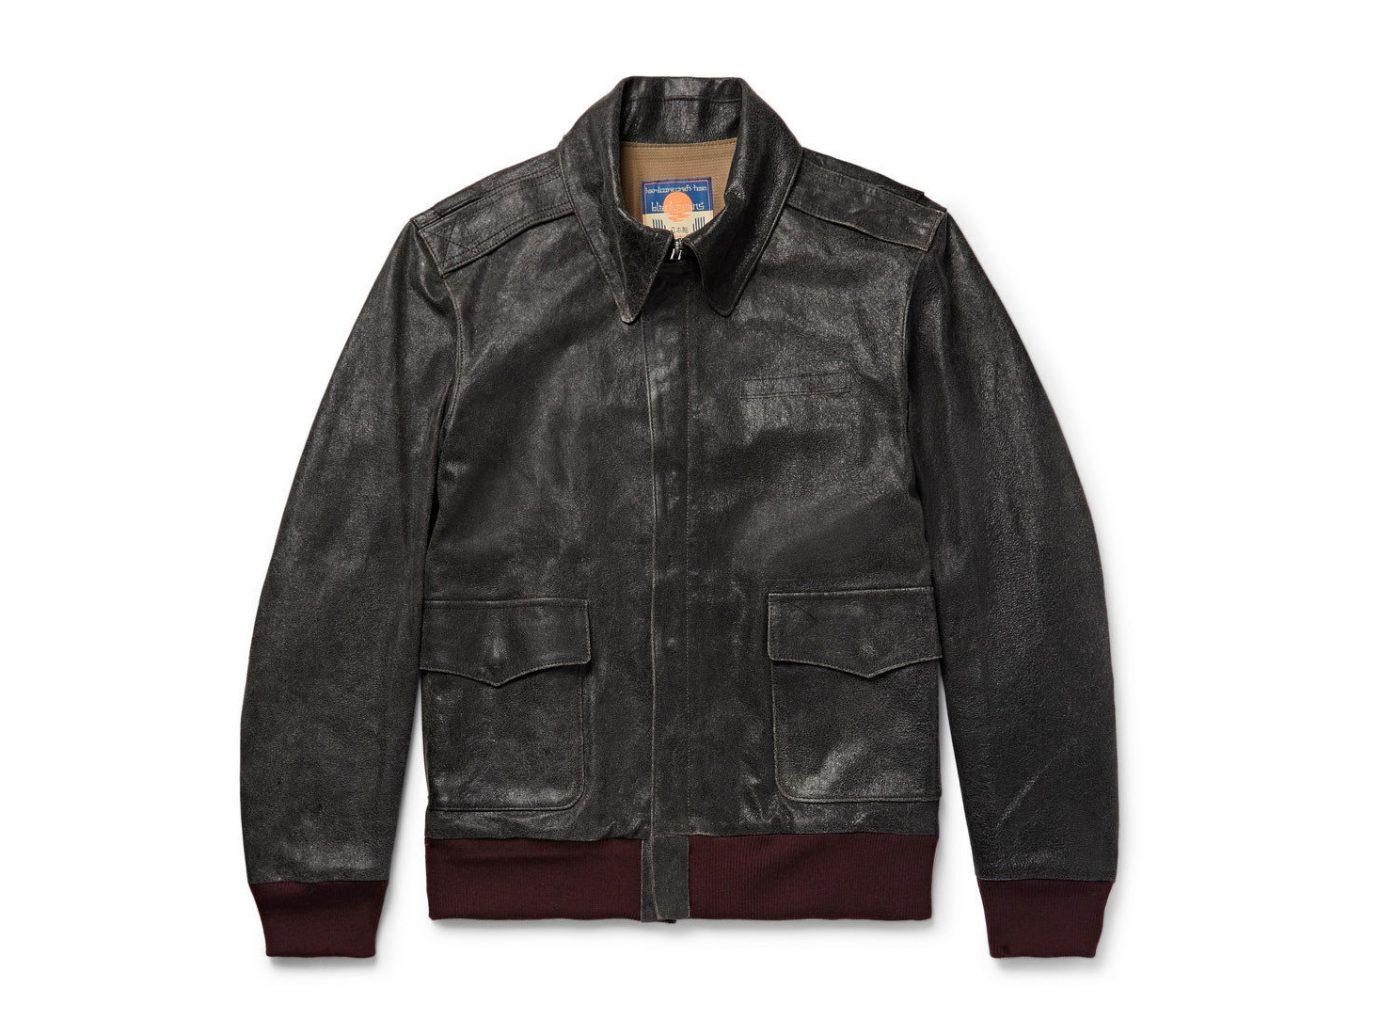 Packing Tips Style + Design Travel Shop jacket leather jacket leather textile product